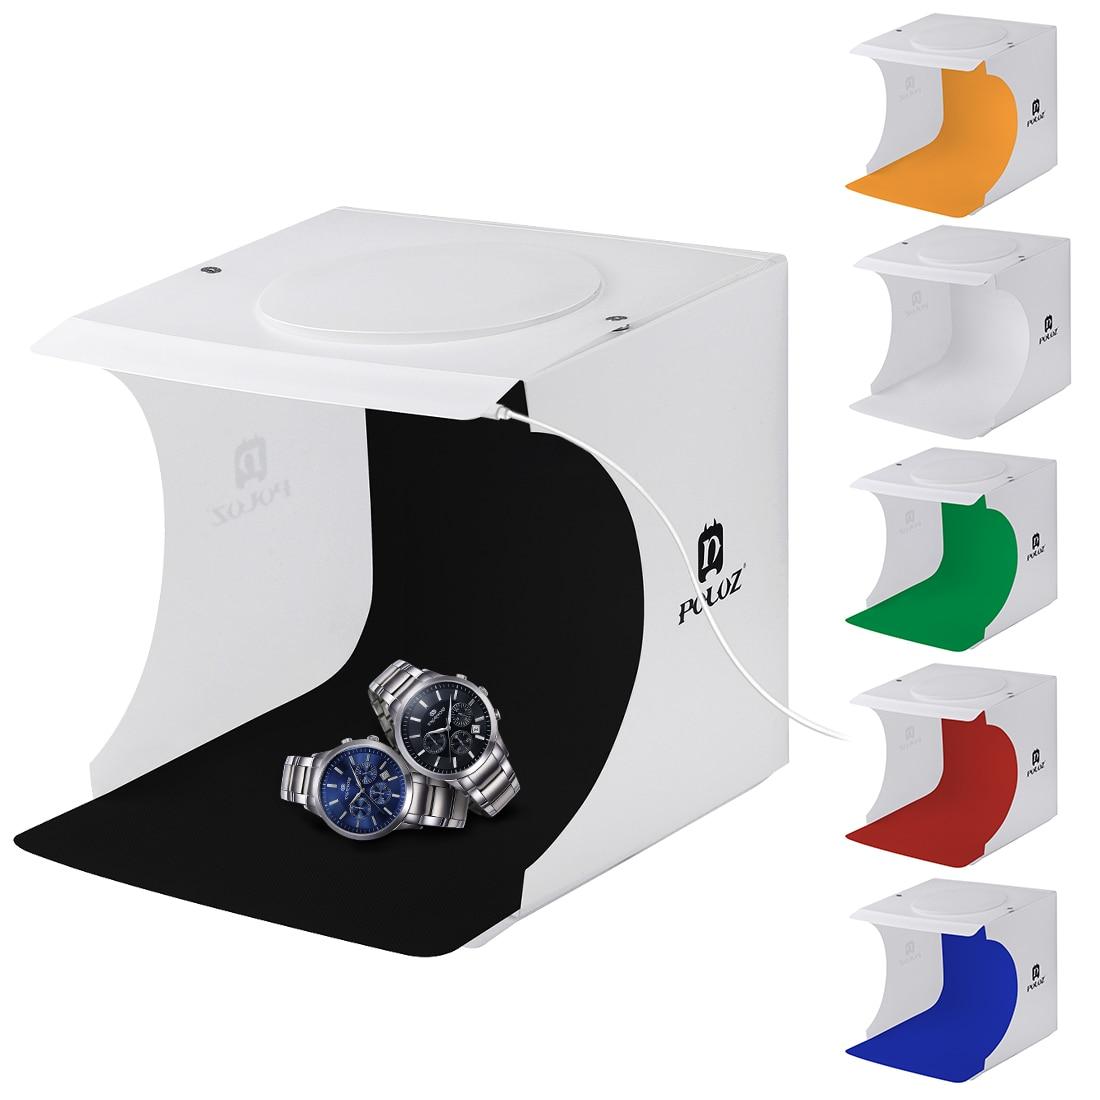 PULUZ Softbox Portable Foldable Design Mini Small Size LED Photography Studio Box Waterproof Soft Lightbox Kit for SLR Cameras